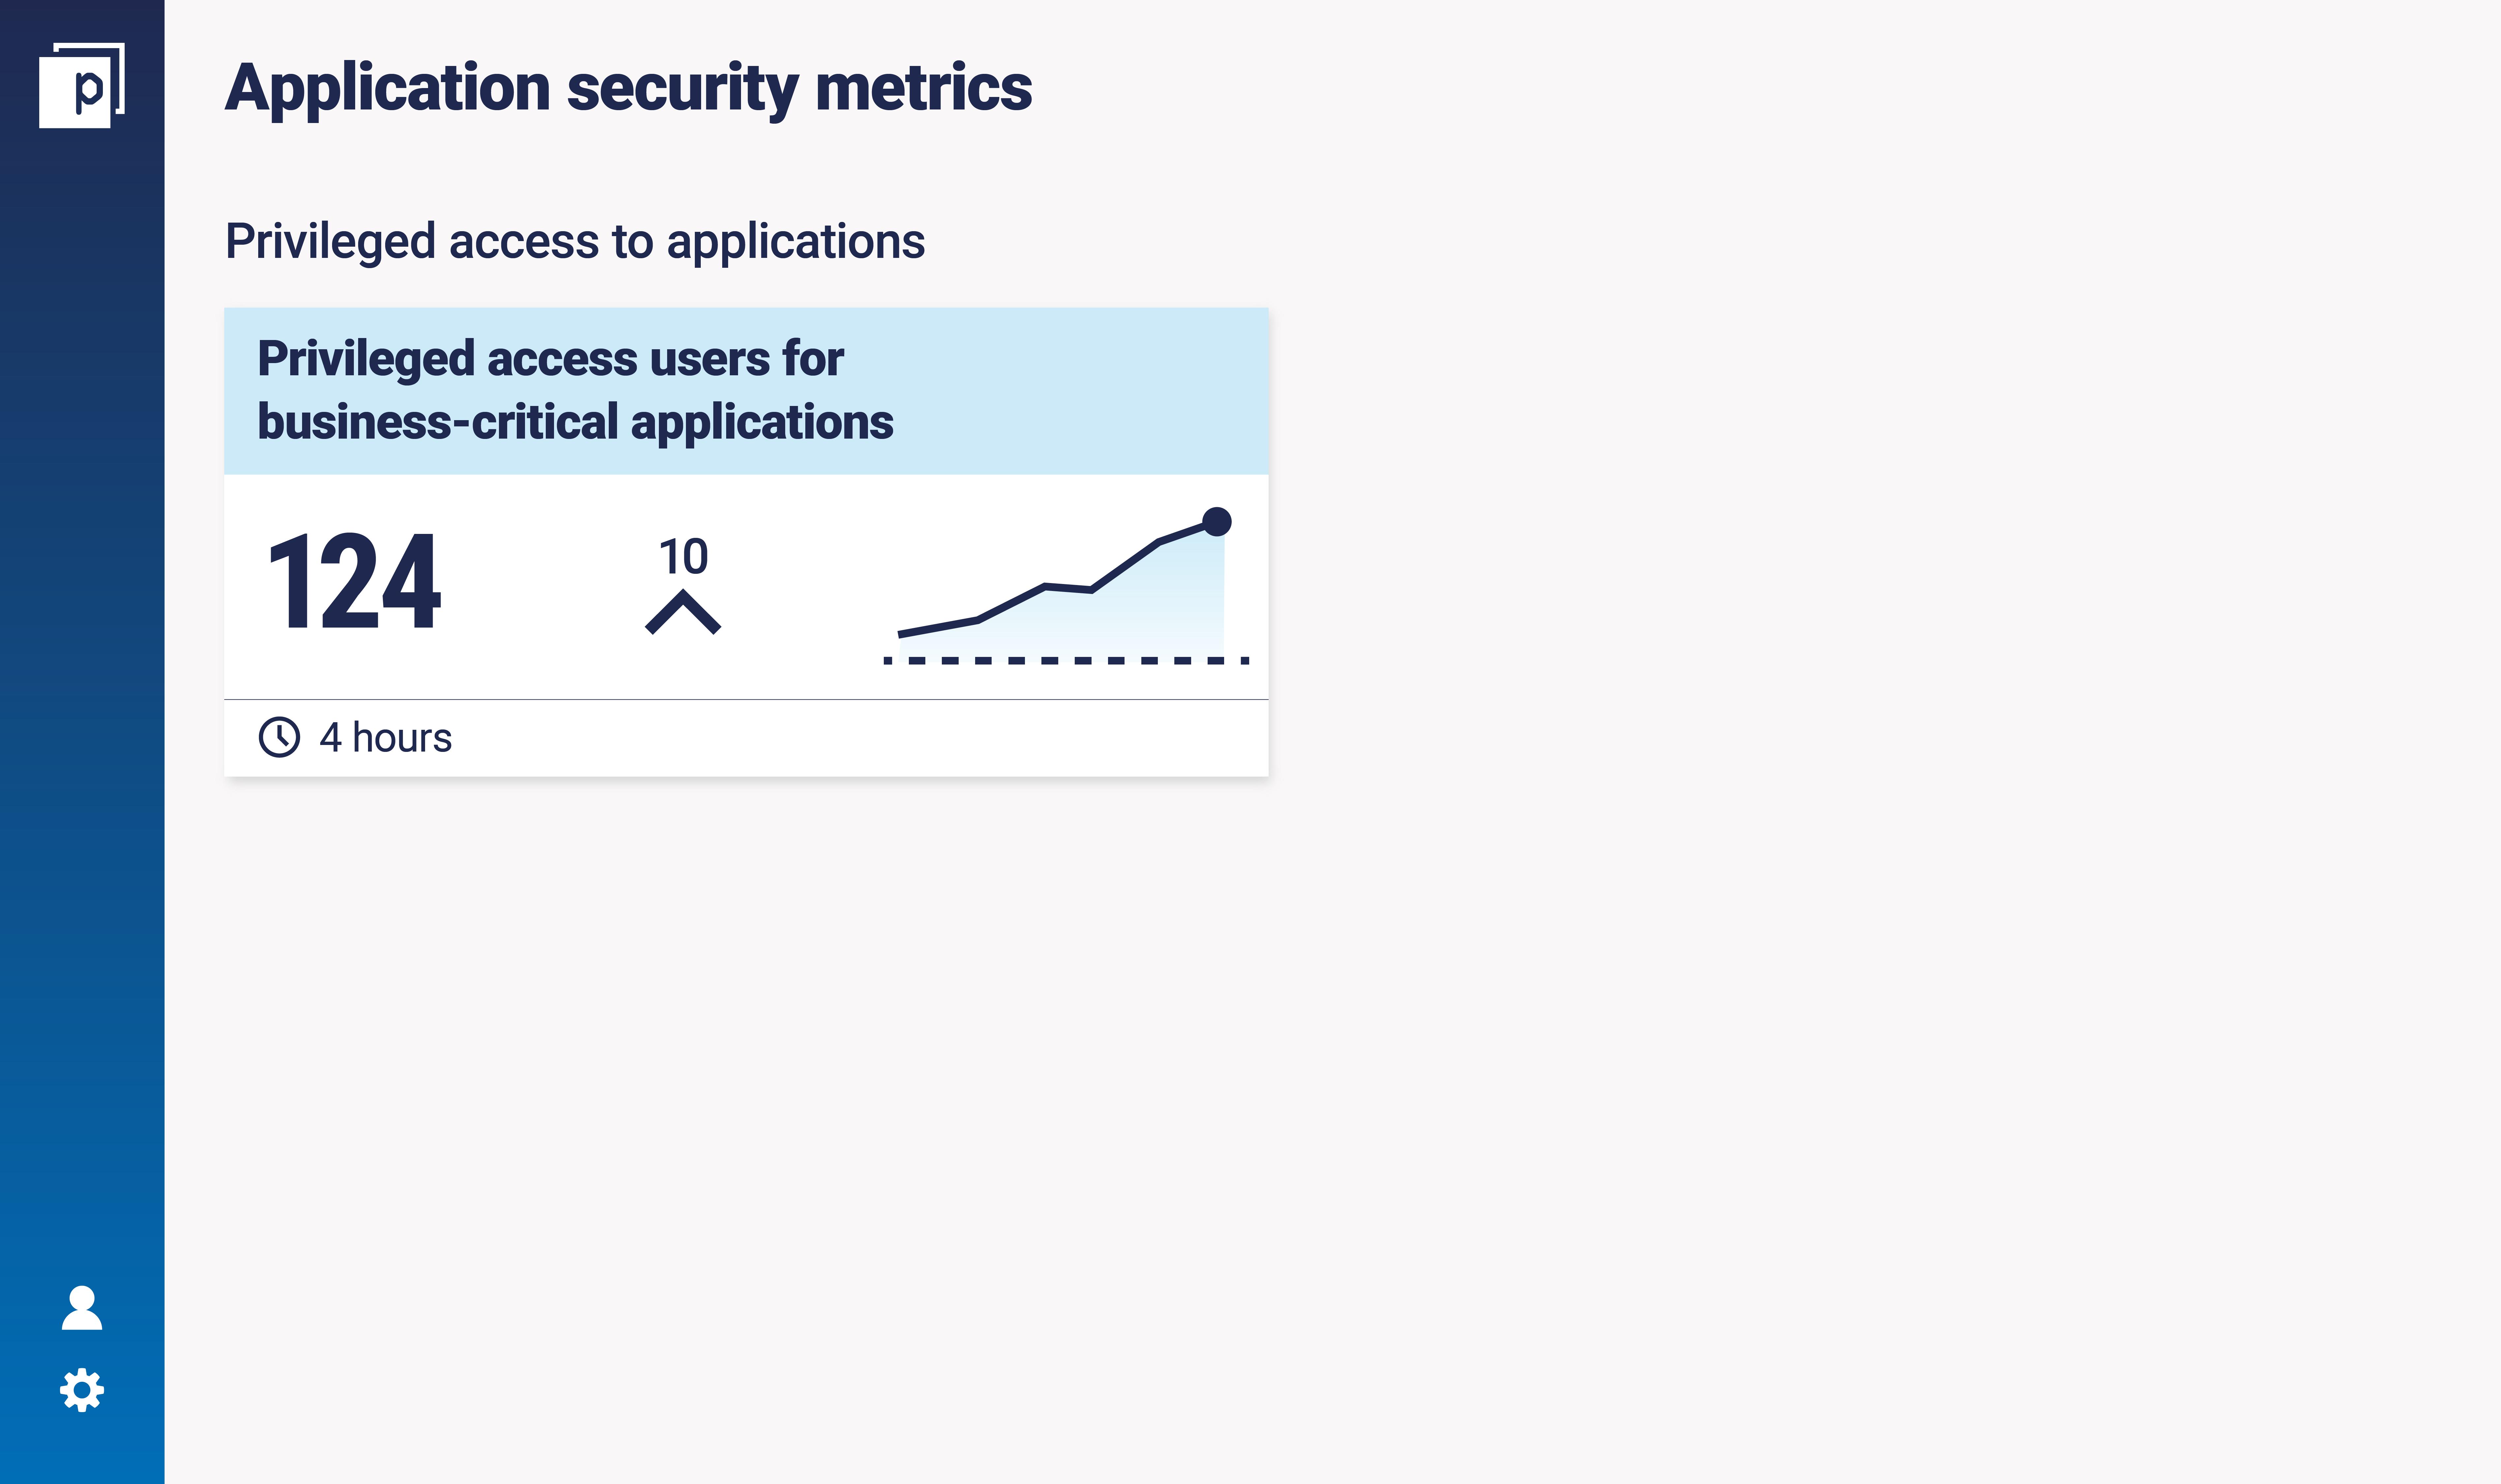 Application security metrics dashboard - access